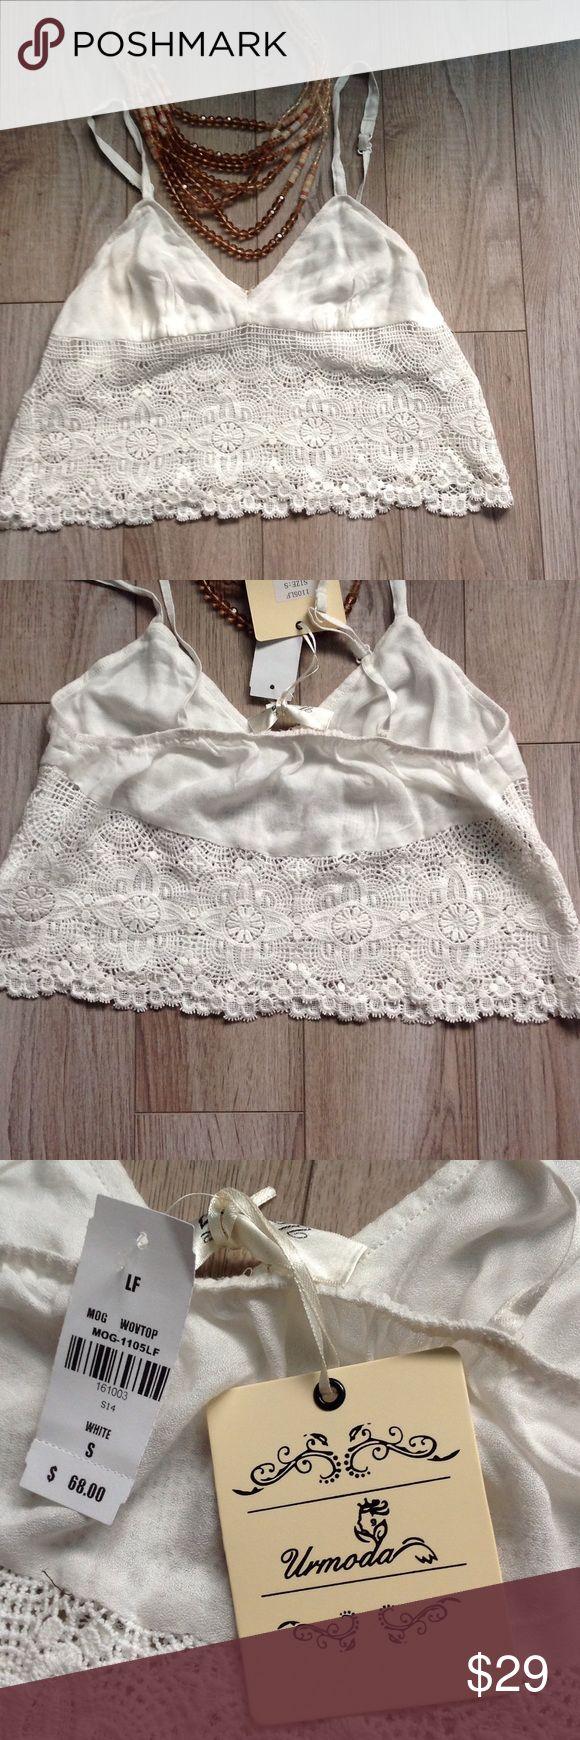 "Urmoda crop crochet cami Brand new with tags boutique item. Solid top with crochet bottom.  13"" across bust urmoda Tops Camisoles"